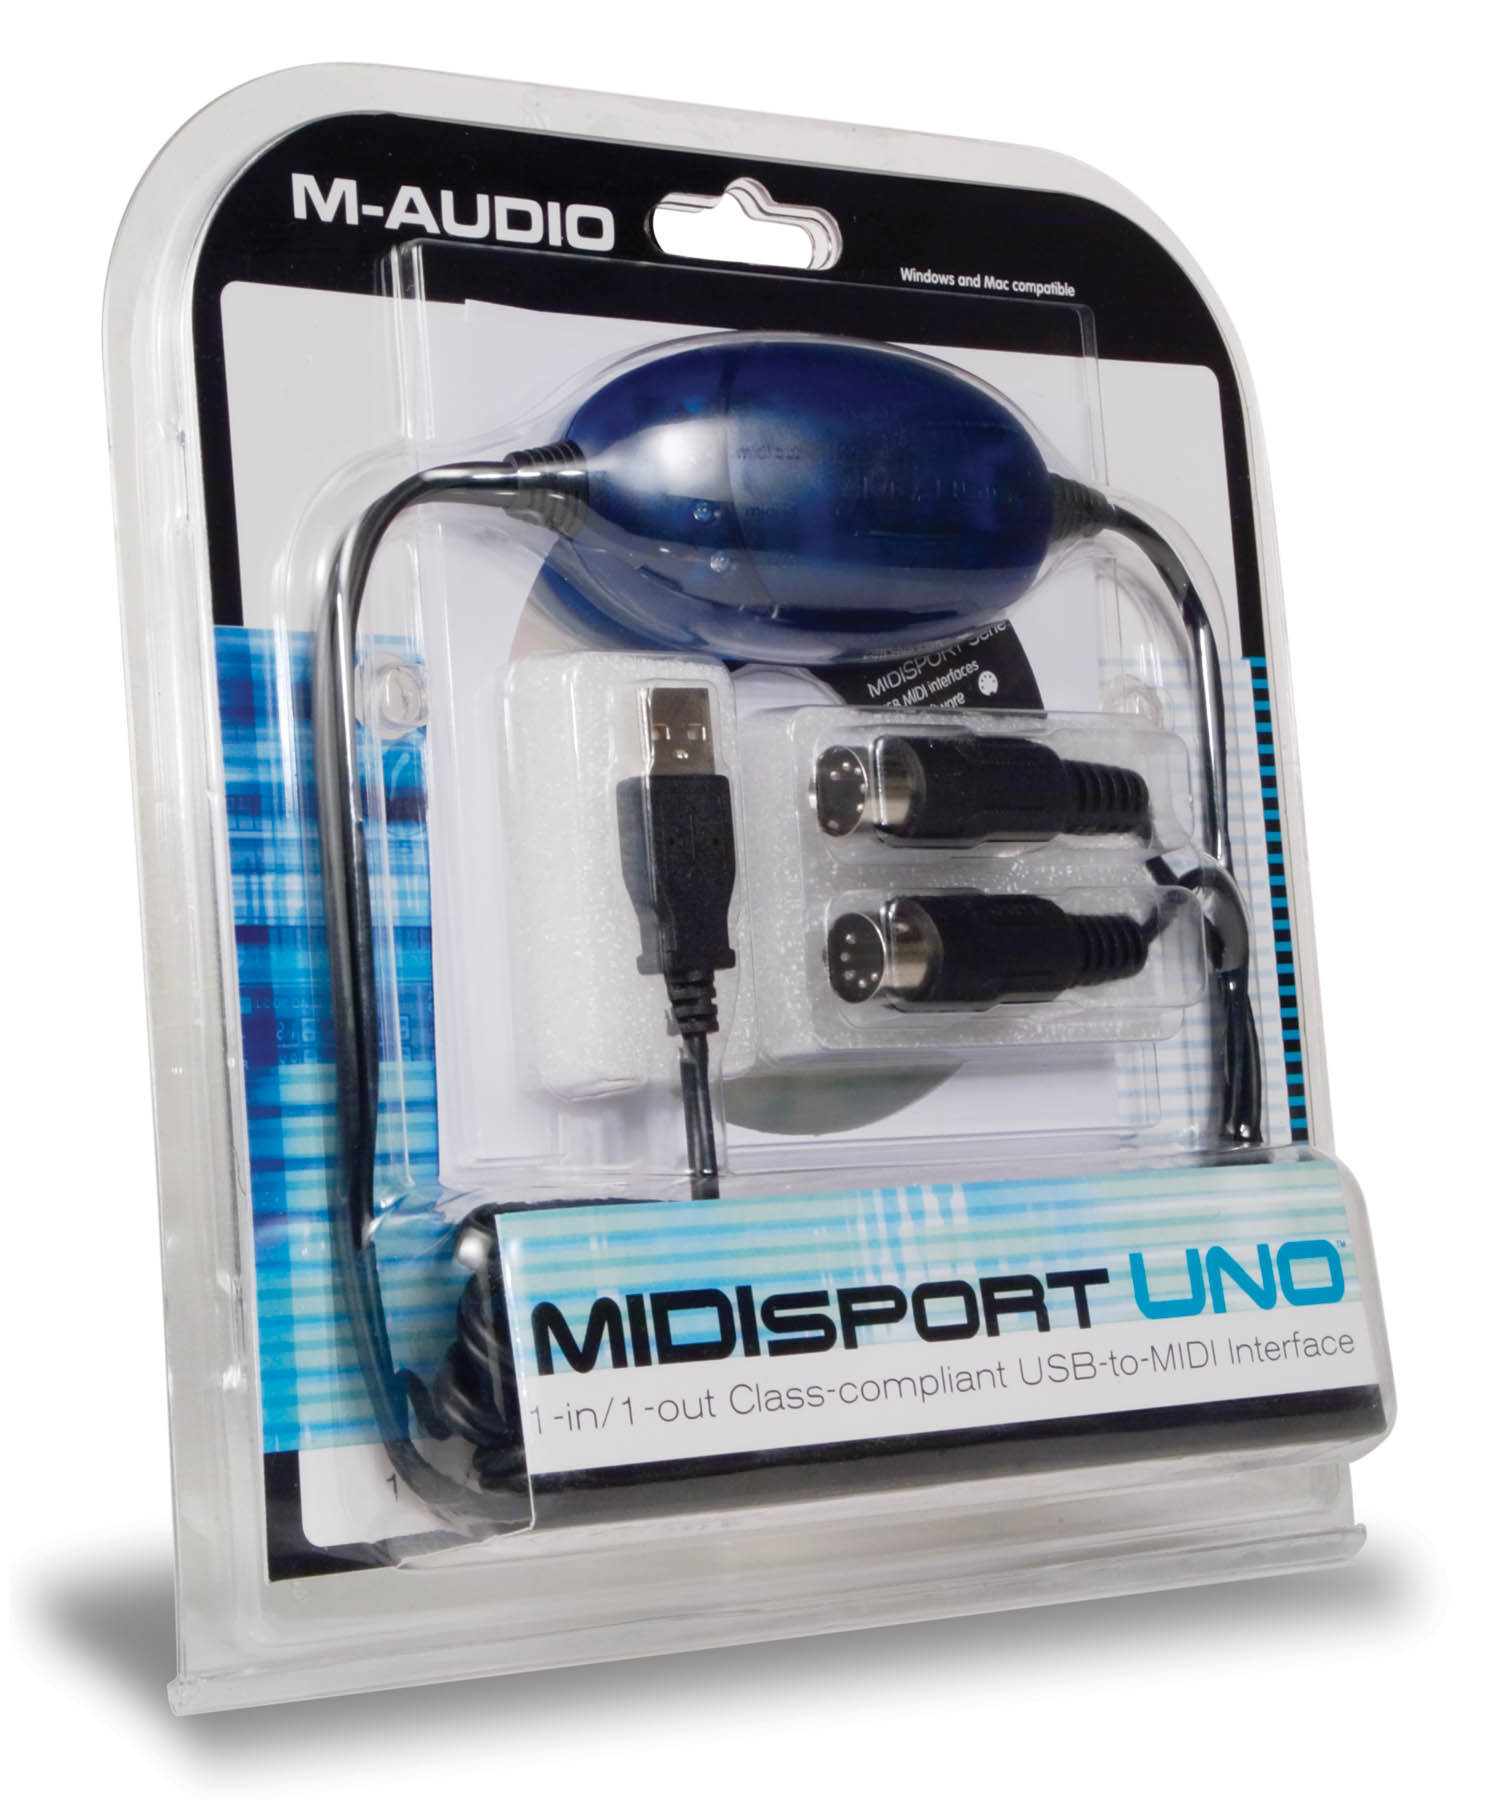 Uno: 1 In / 1 Out MIDI Interface